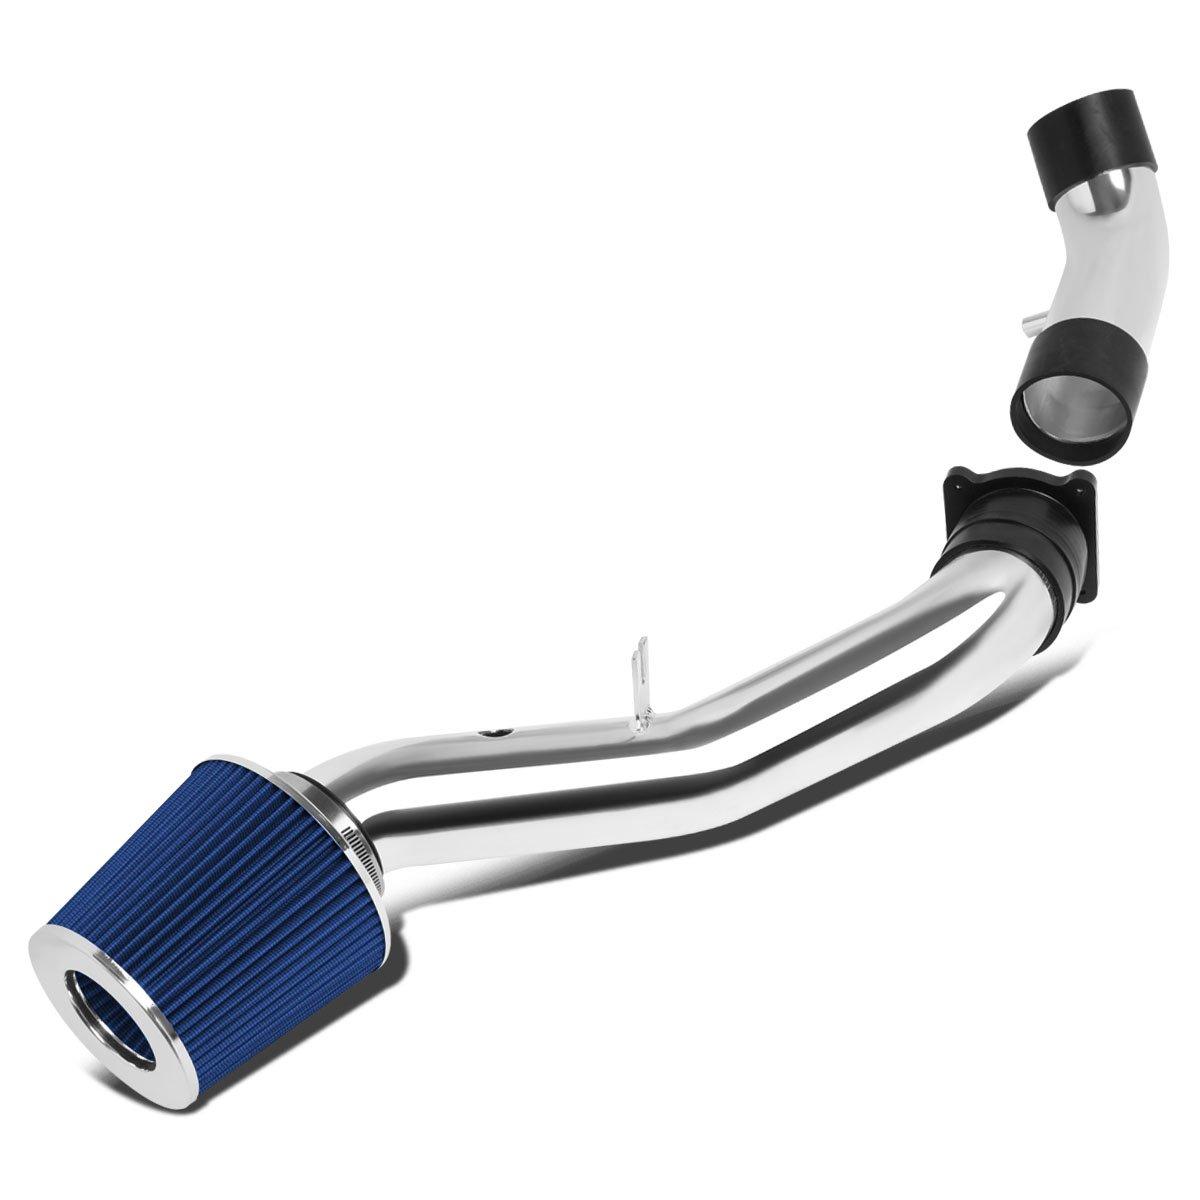 DNA Motoring ITK-0054-BL Cold Air Intake System Blue For 03-06 Nissan 350Z